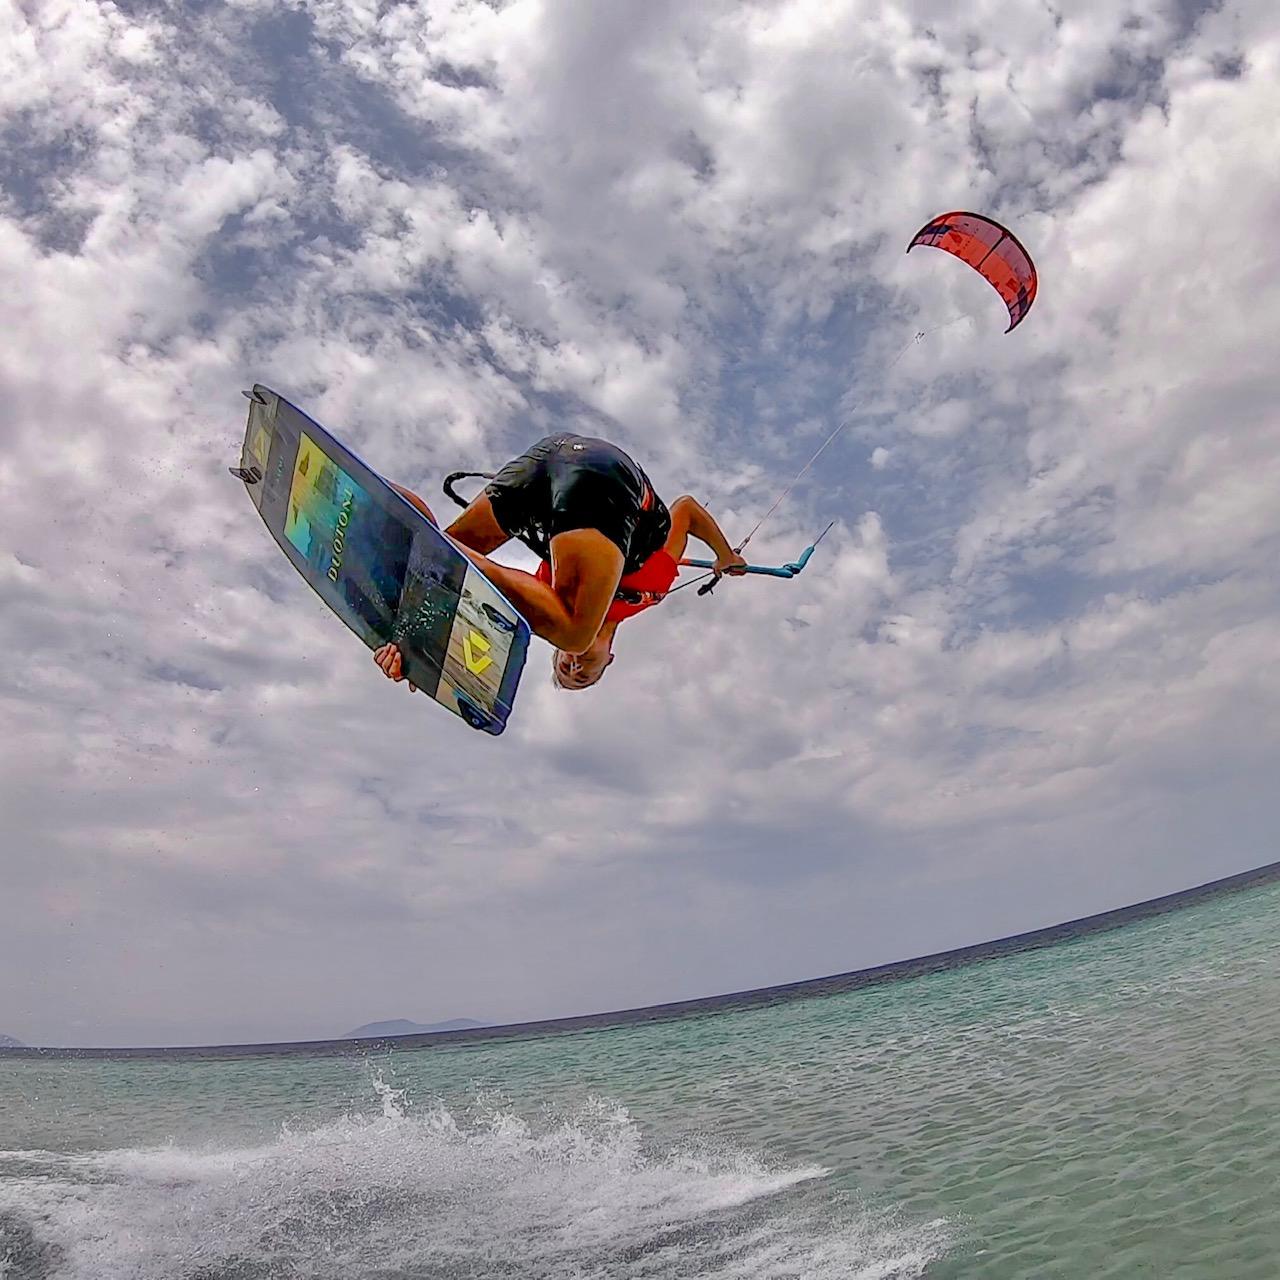 spot kitesurfingowy we włoszech, kitesurfing marsala, kitesurfing in italy